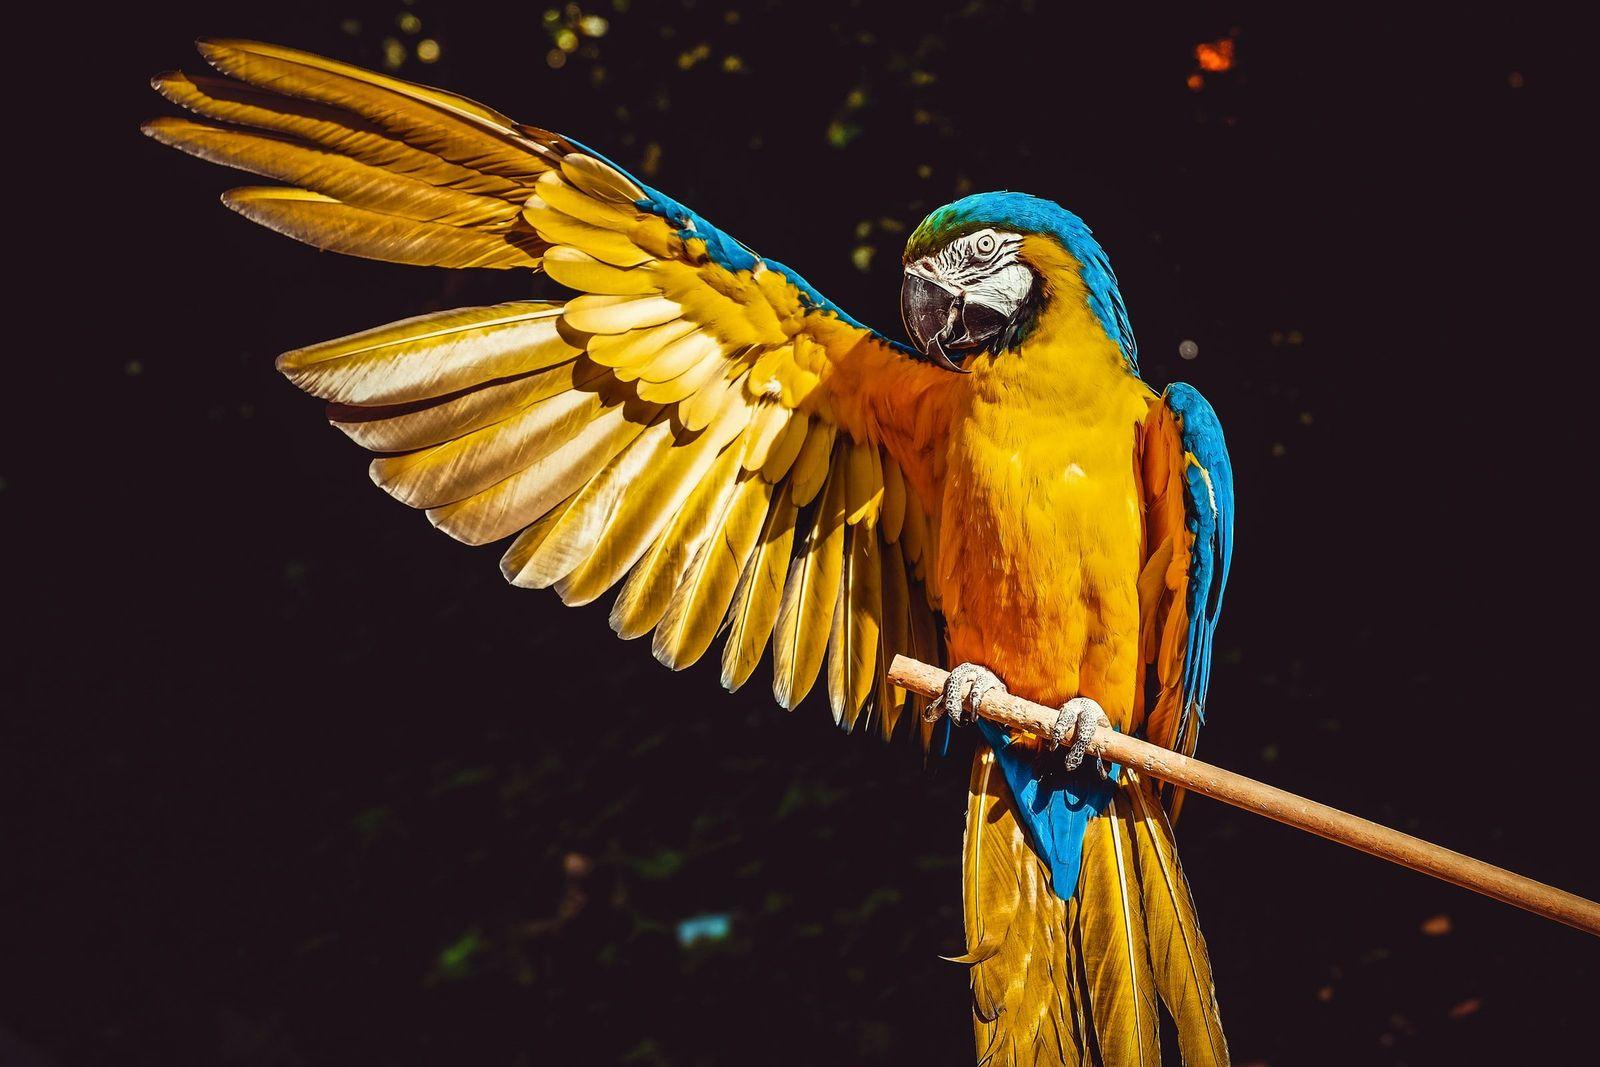 Proventricular dilatation disease (PDD) in birds - Vetster